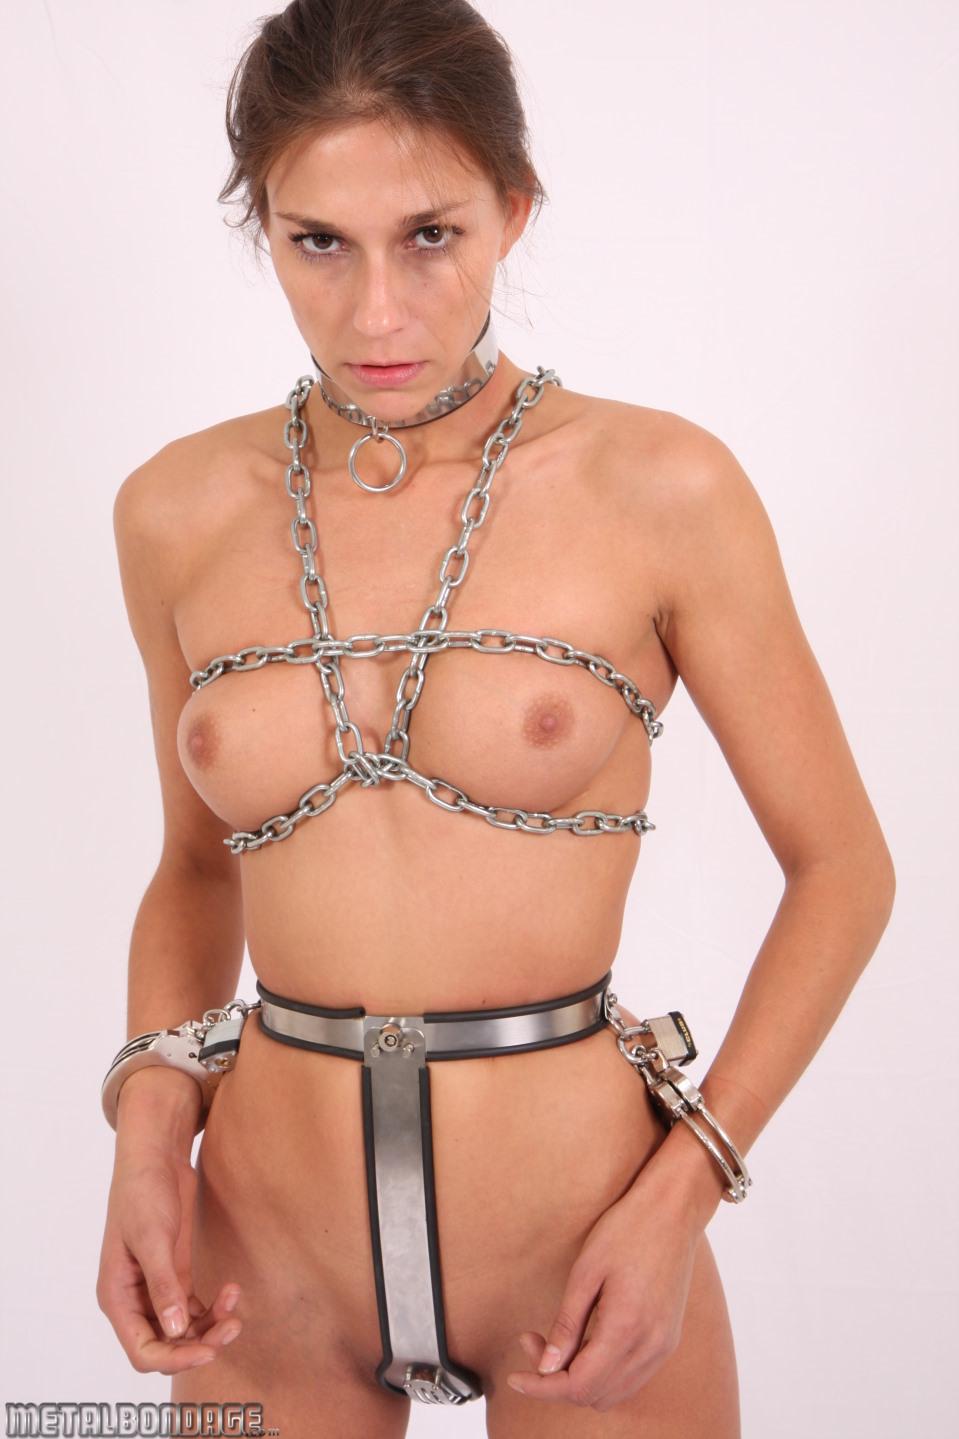 metalbondage Zoe